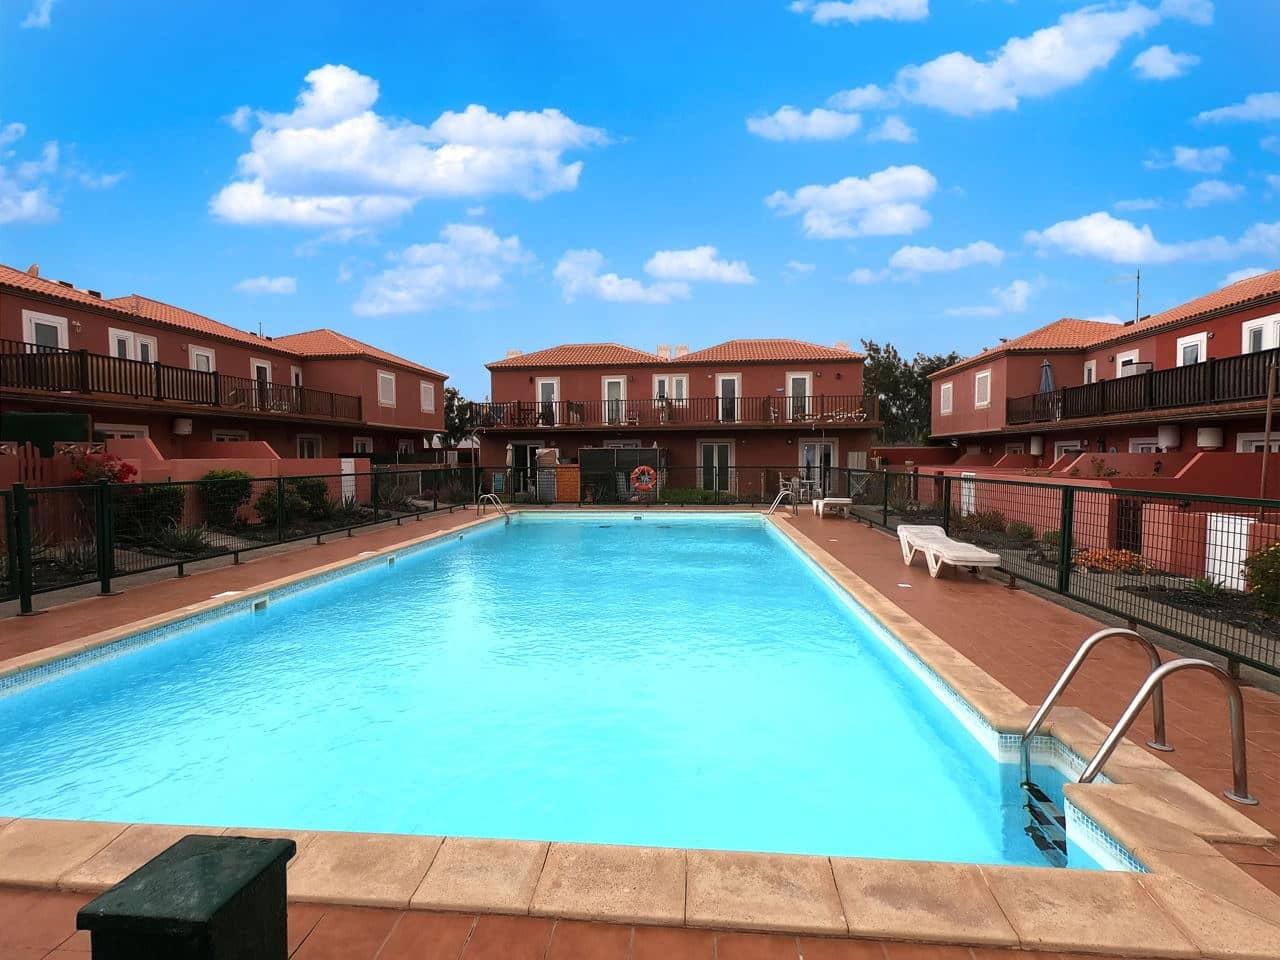 2 soveværelse Byhus til salg i Costa de Antigua med swimmingpool - € 100.000 (Ref: 5311557)